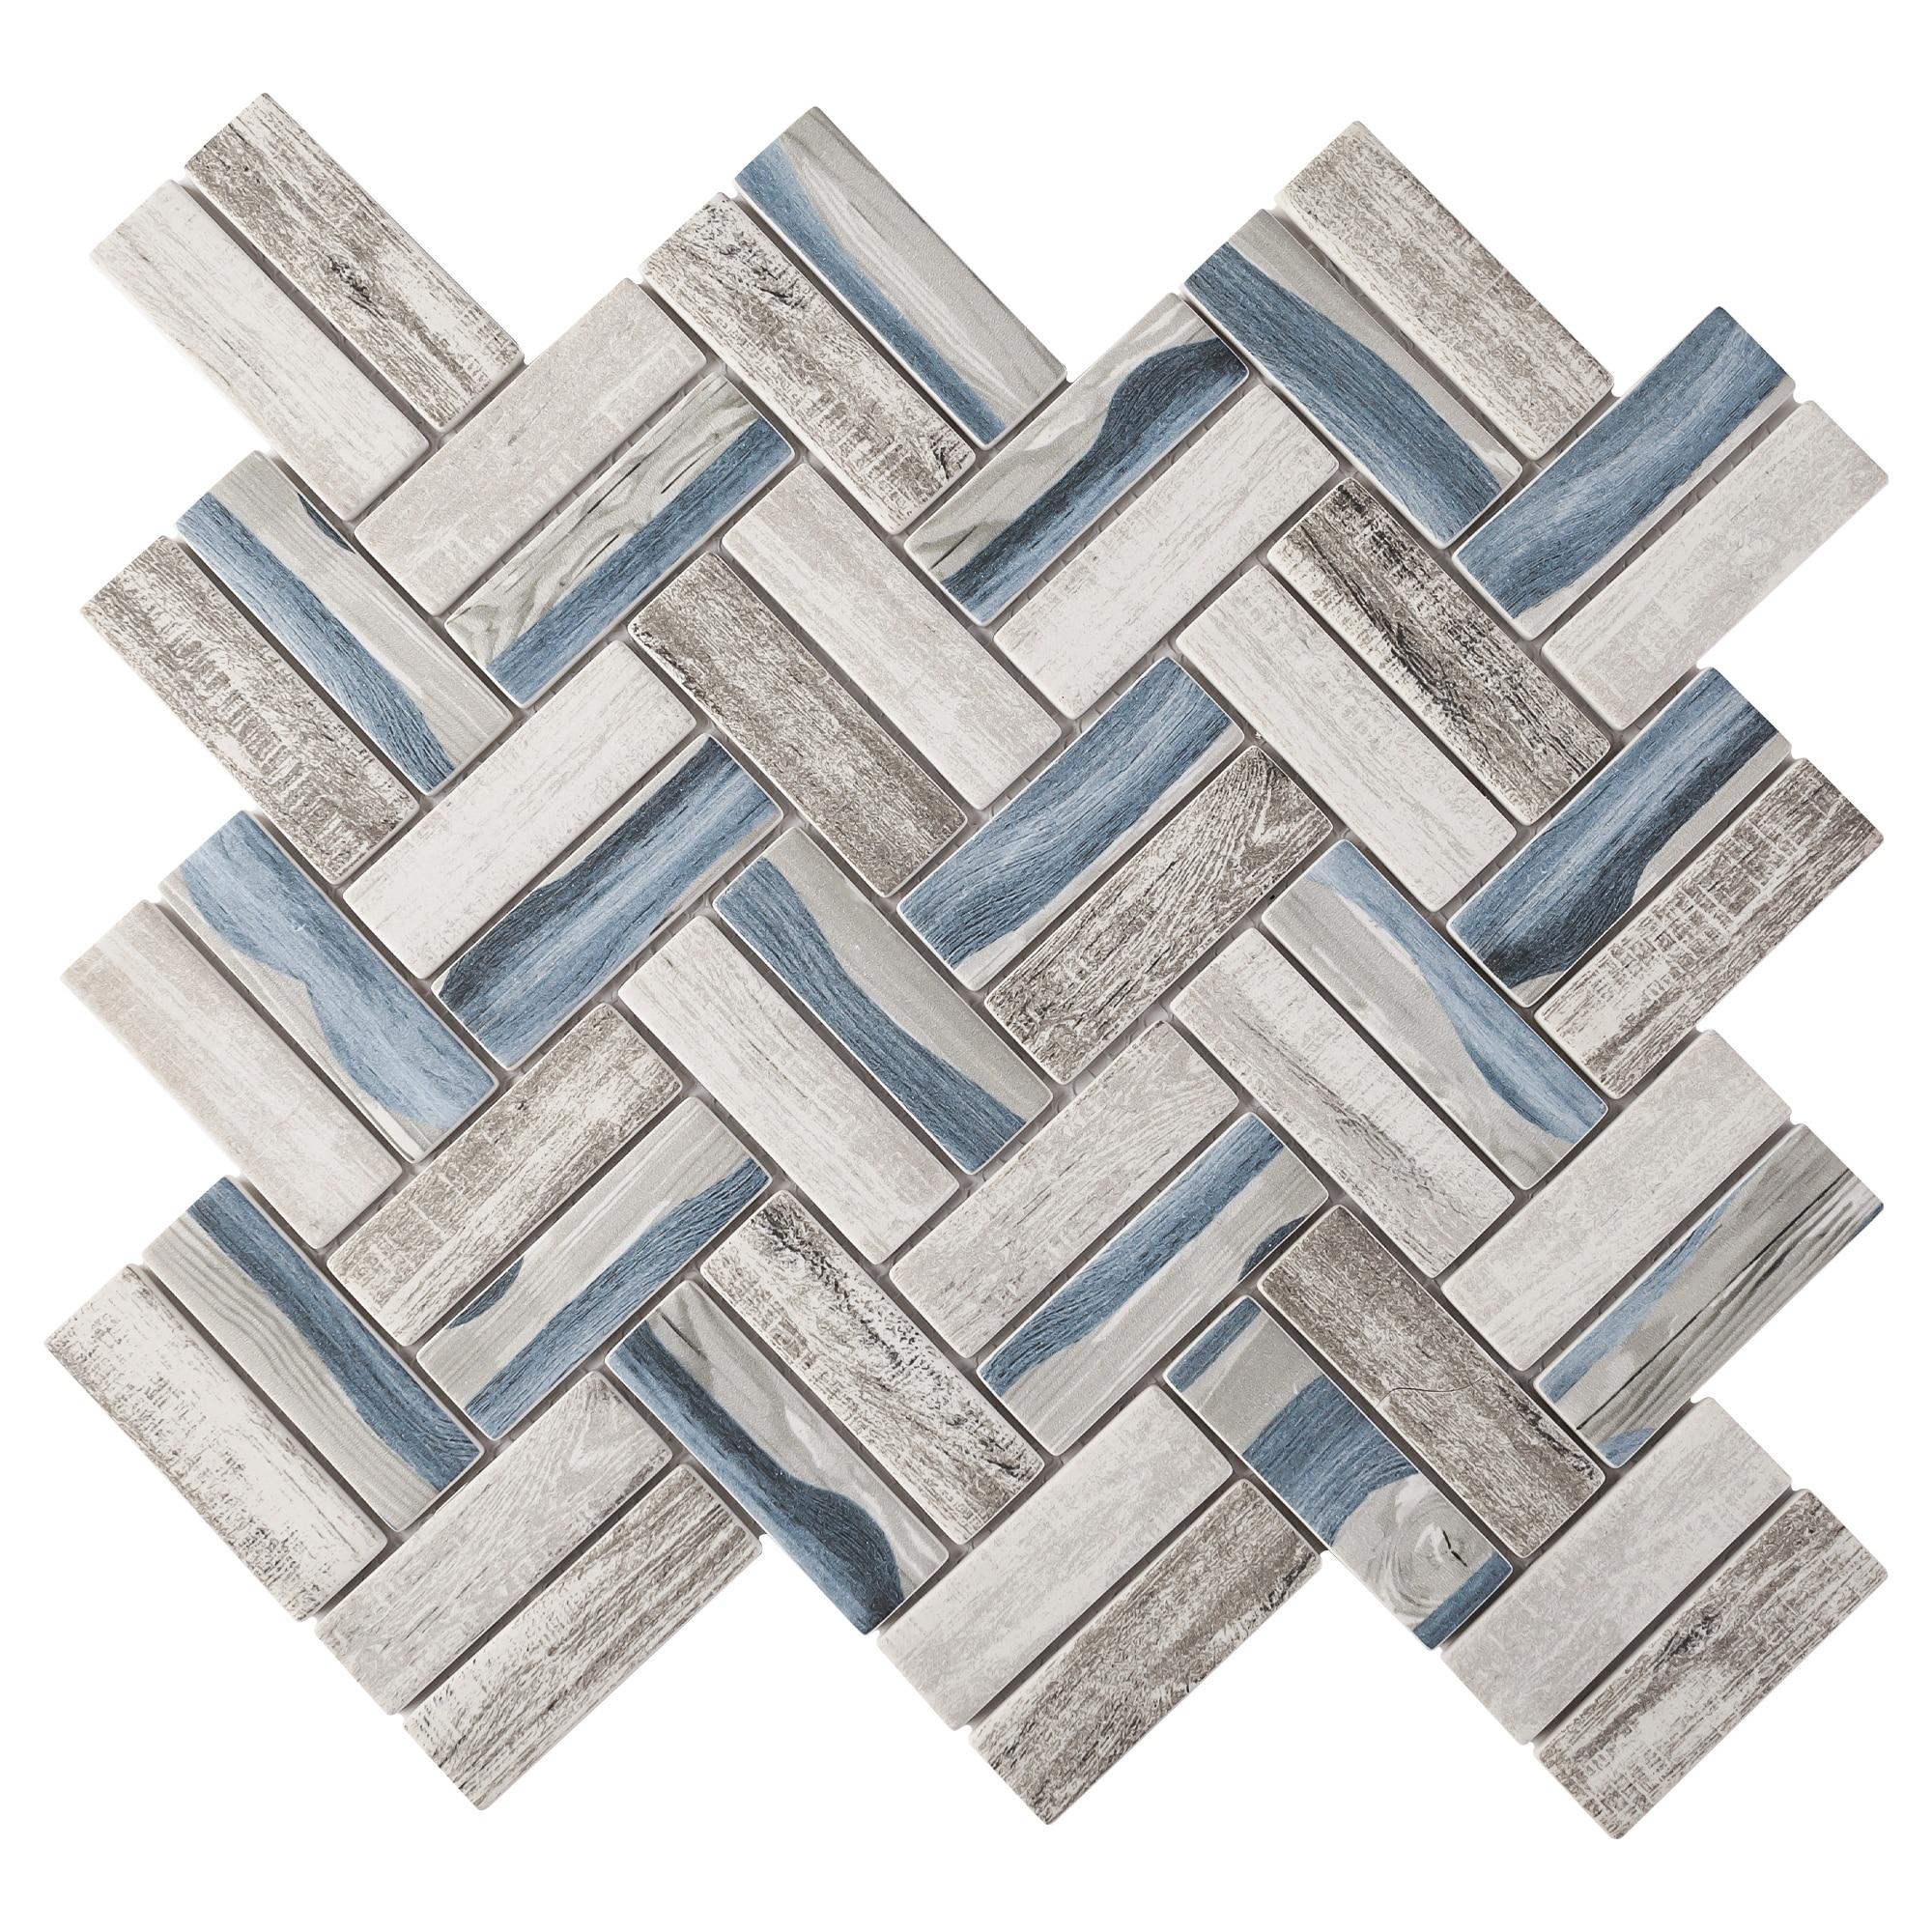 tilegen recycle herringbone wooden look 1 x 3 glass mosaic tile in blue gray wall tile 10 sheets 9 6sqft